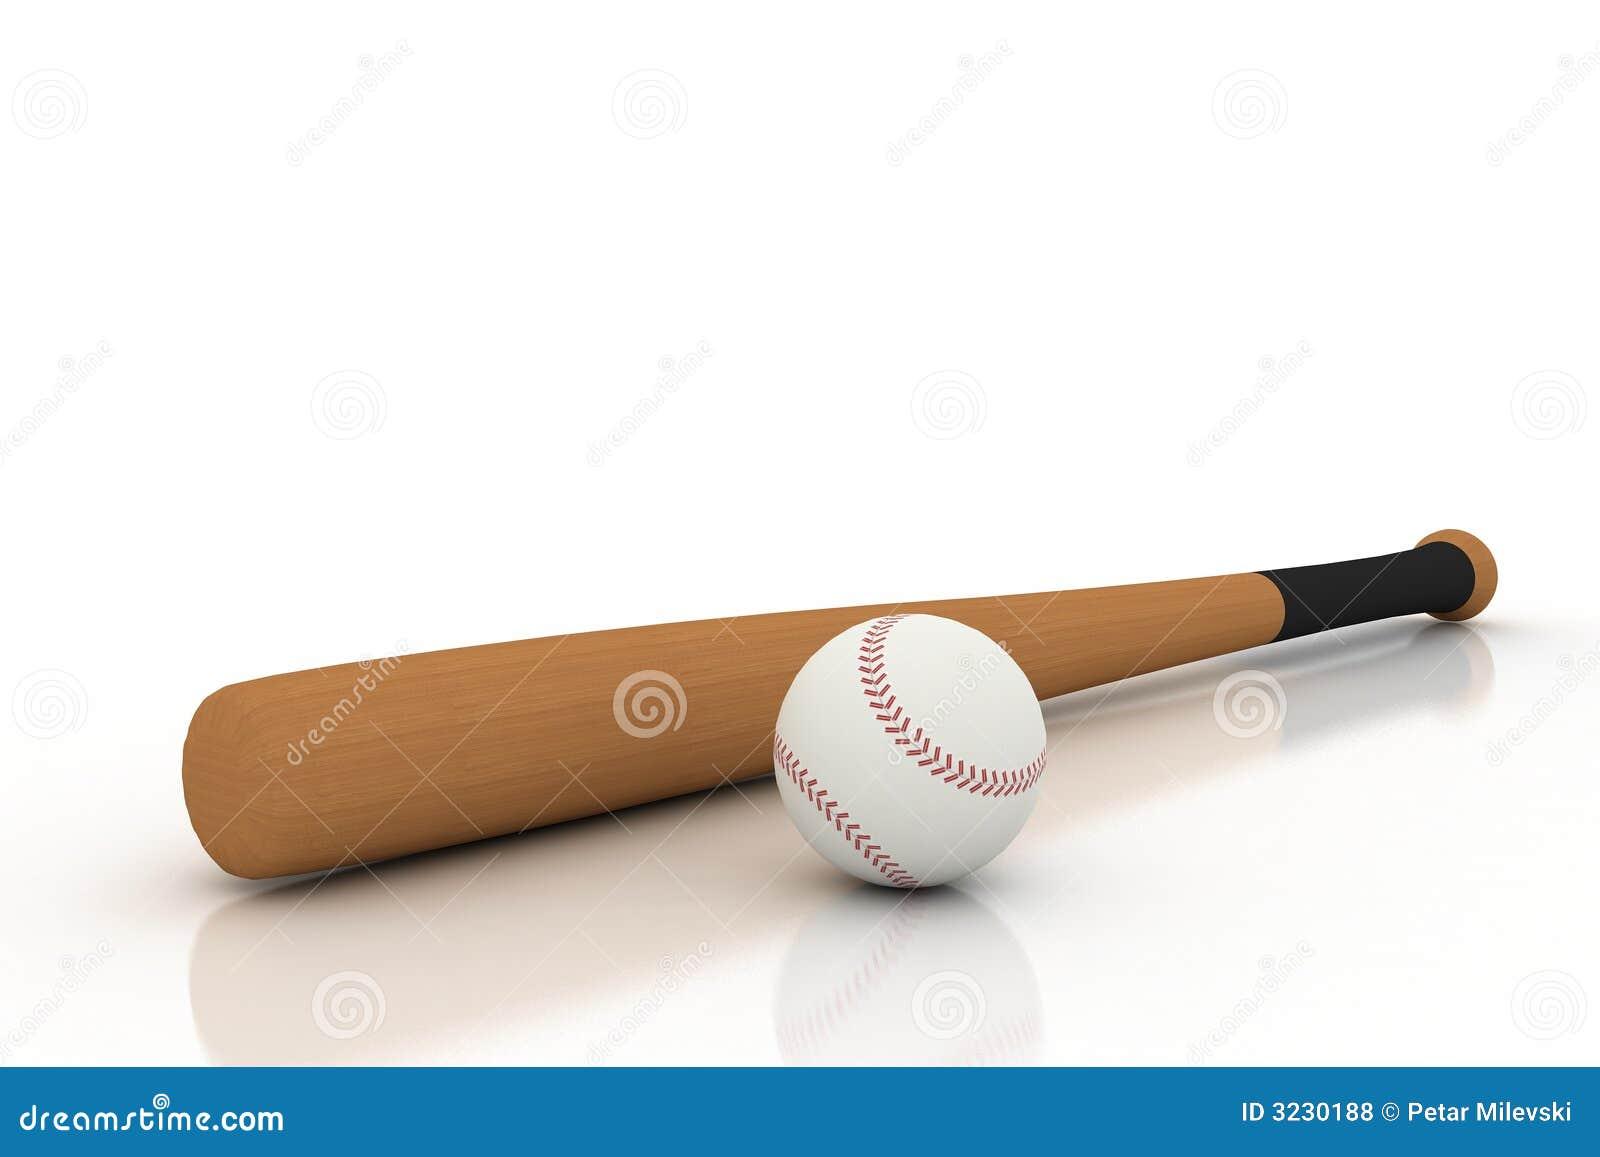 Baseball Bat And Ball On White Royalty Free Stock Photos ...